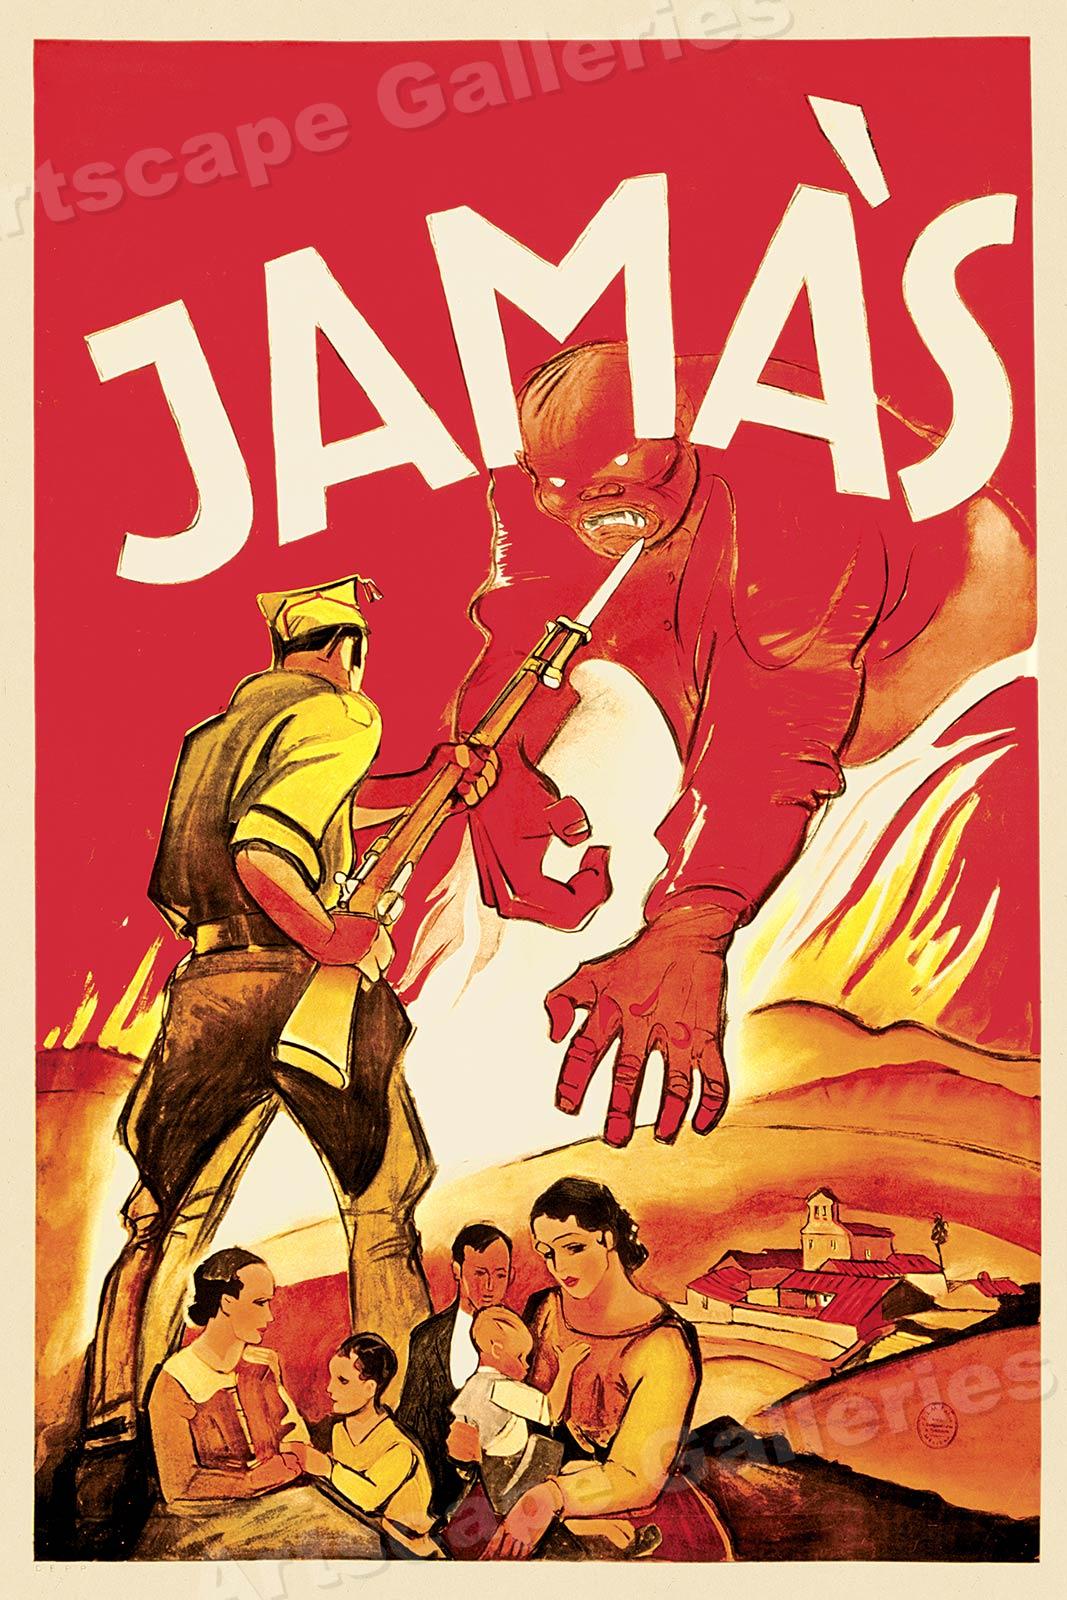 Los Trabajadores 1930s Spanish Civil War Poster 18x24